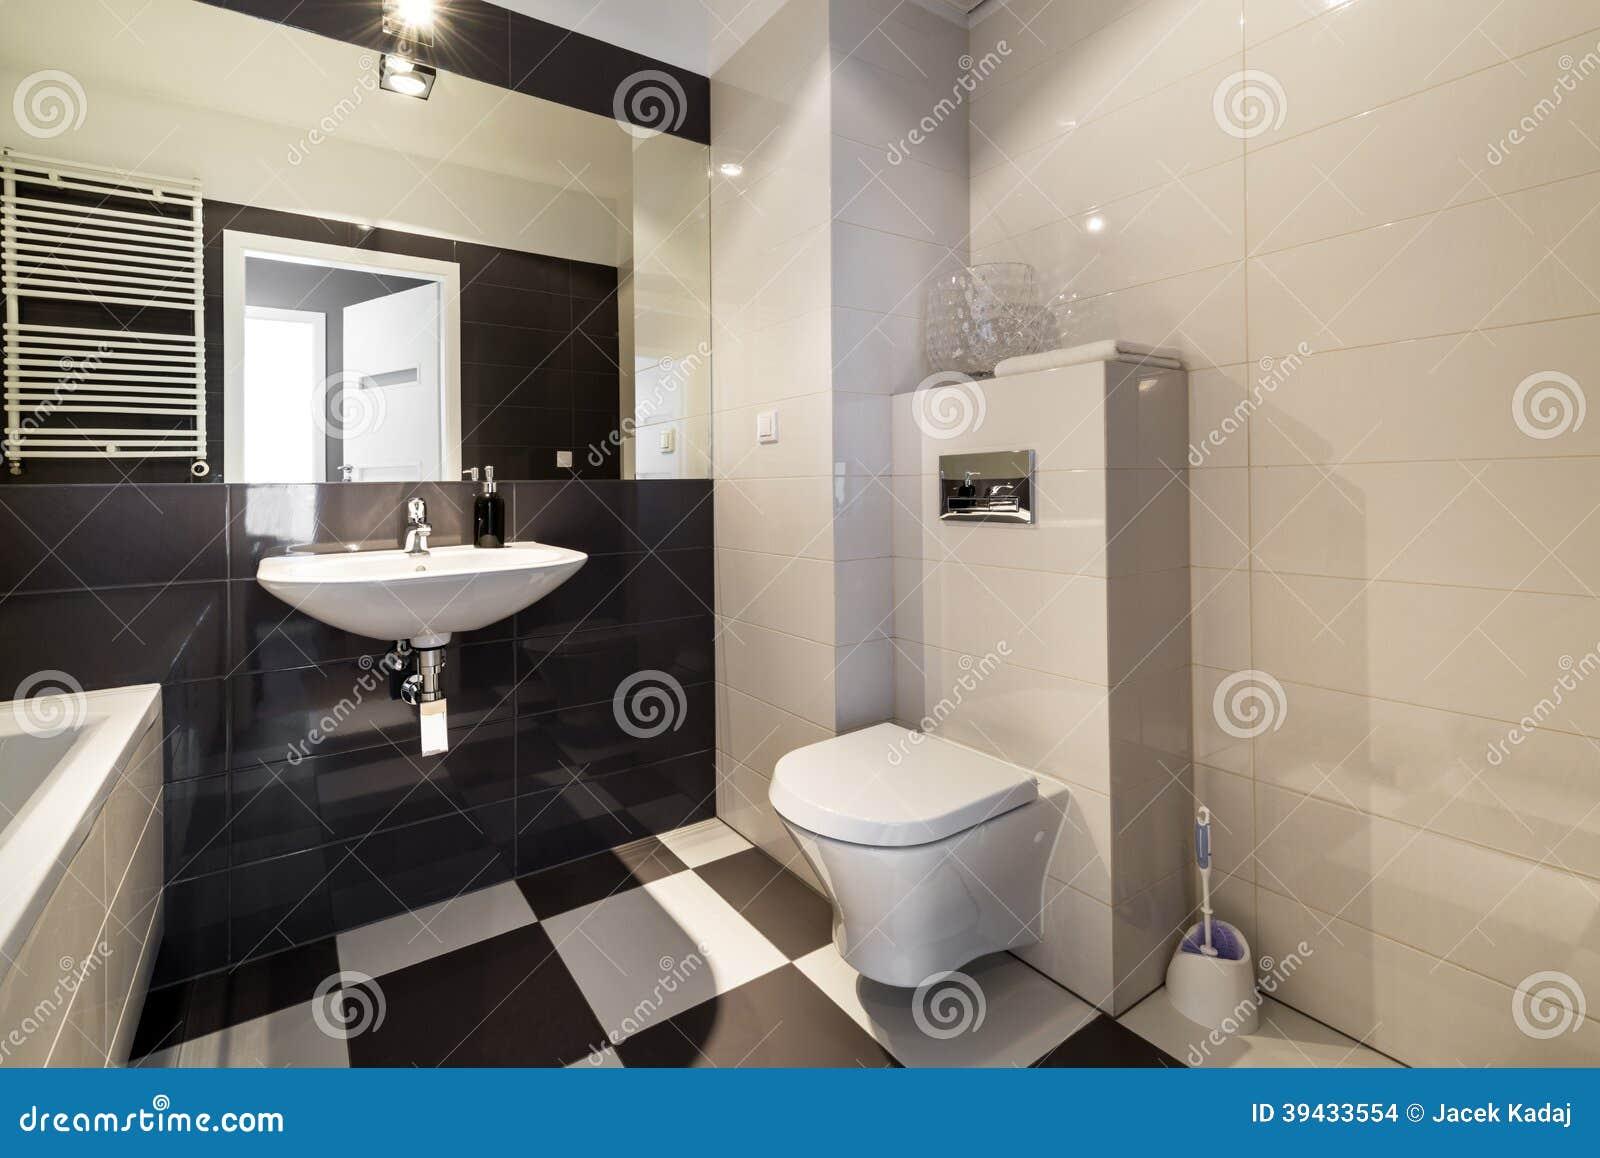 Modernt Badrum I Beige Färg Arkivfoto - Bild: 39433554